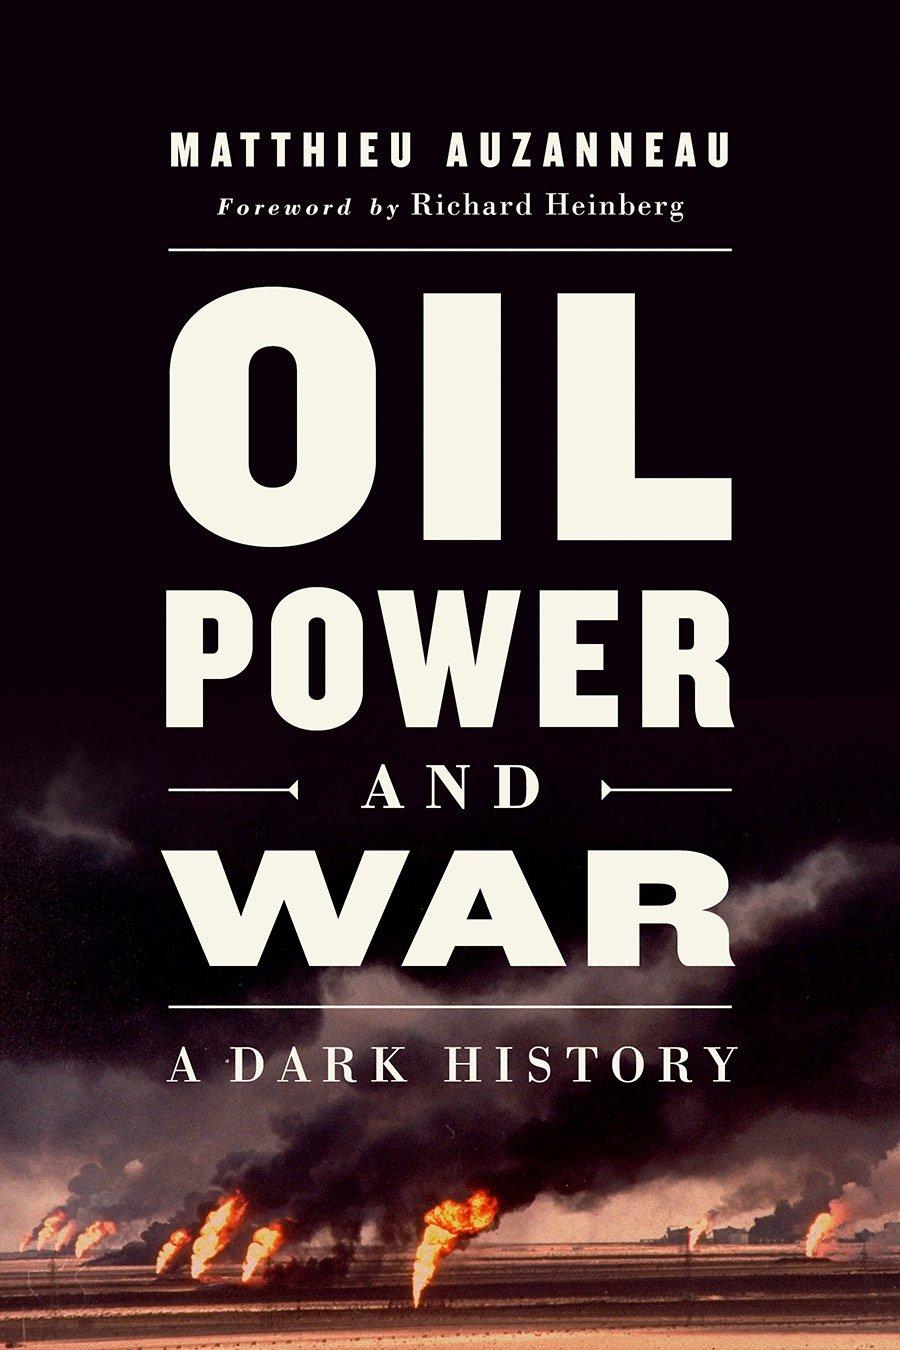 Oil, Power, and War: A Dark History: Auzanneau, Matthieu, Heinberg,  Richard: 9781603587433: Amazon.com: Books